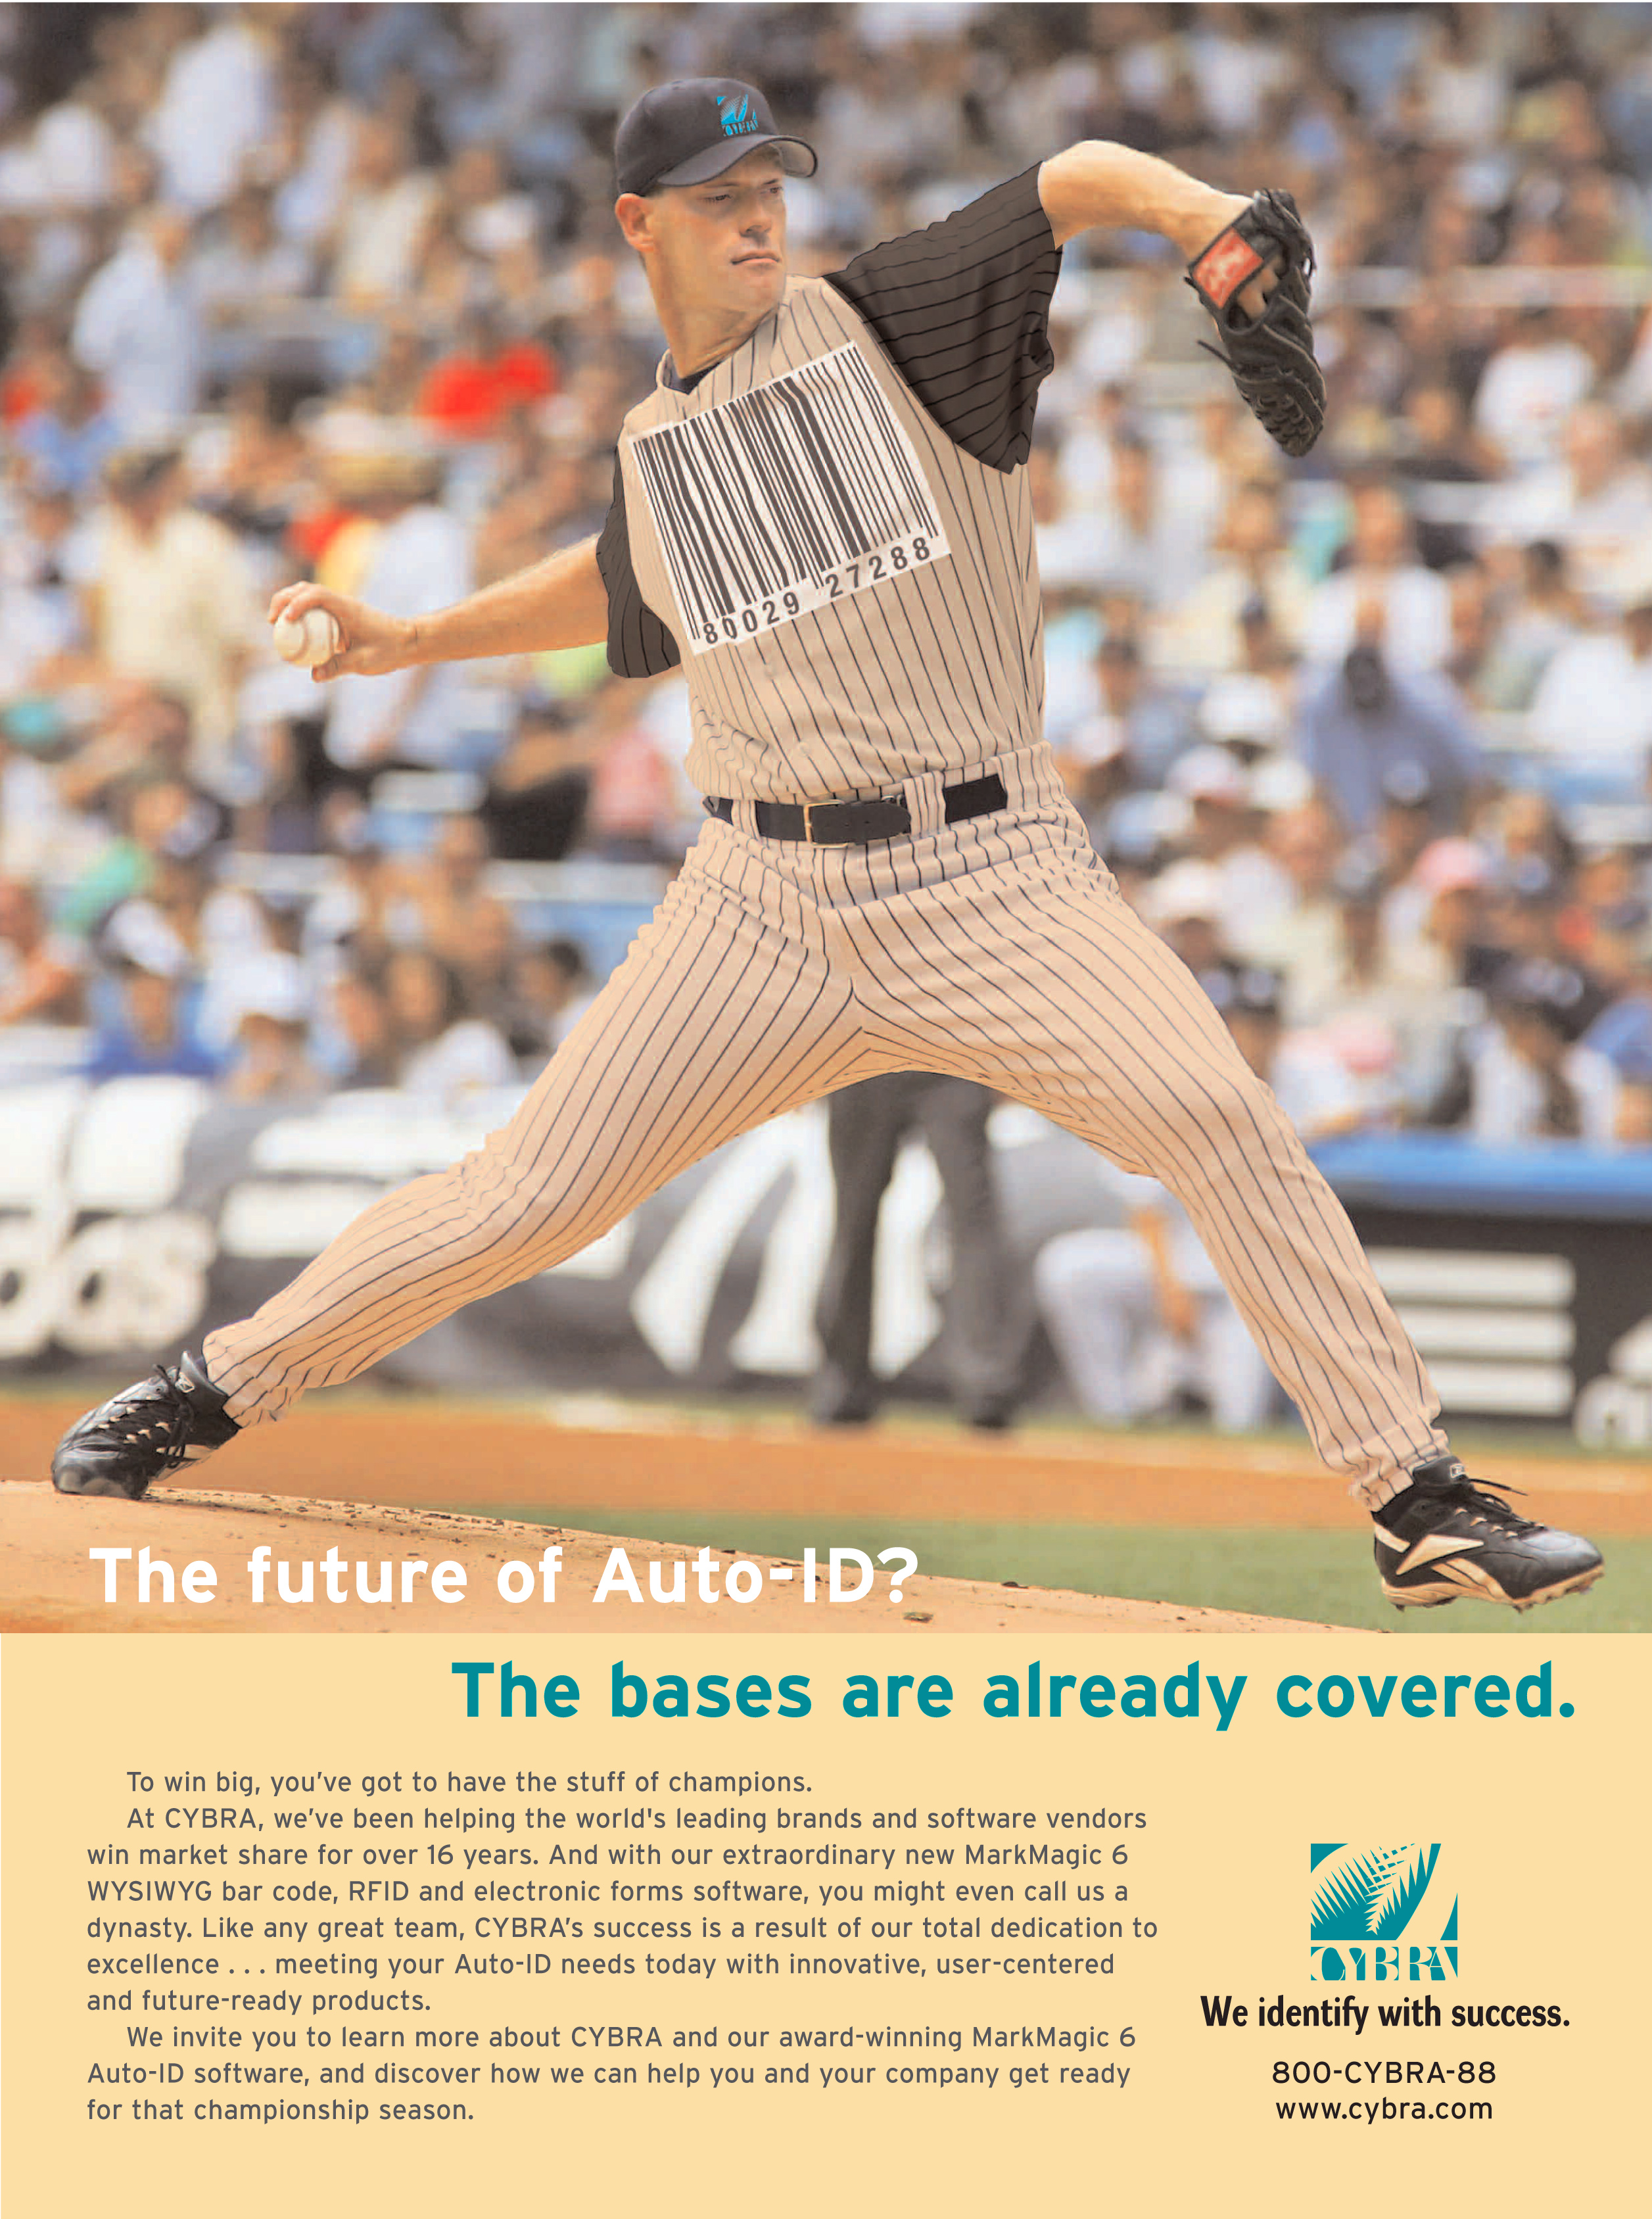 Cybra_baseball_IBM.jpg